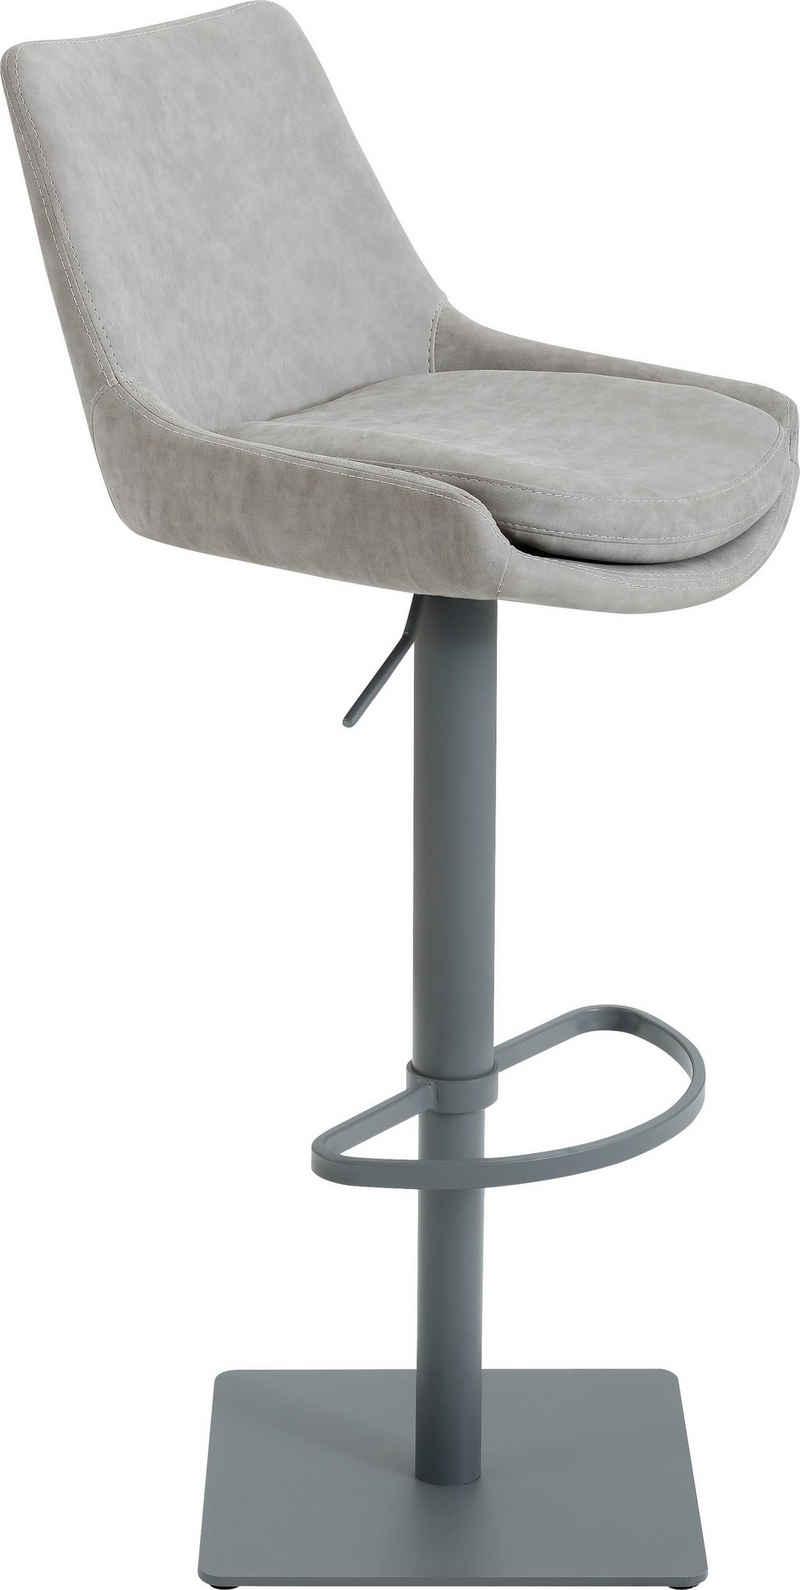 Mayer Sitzmöbel Barhocker »myPEDRO« (1 St), höhenverstellbar